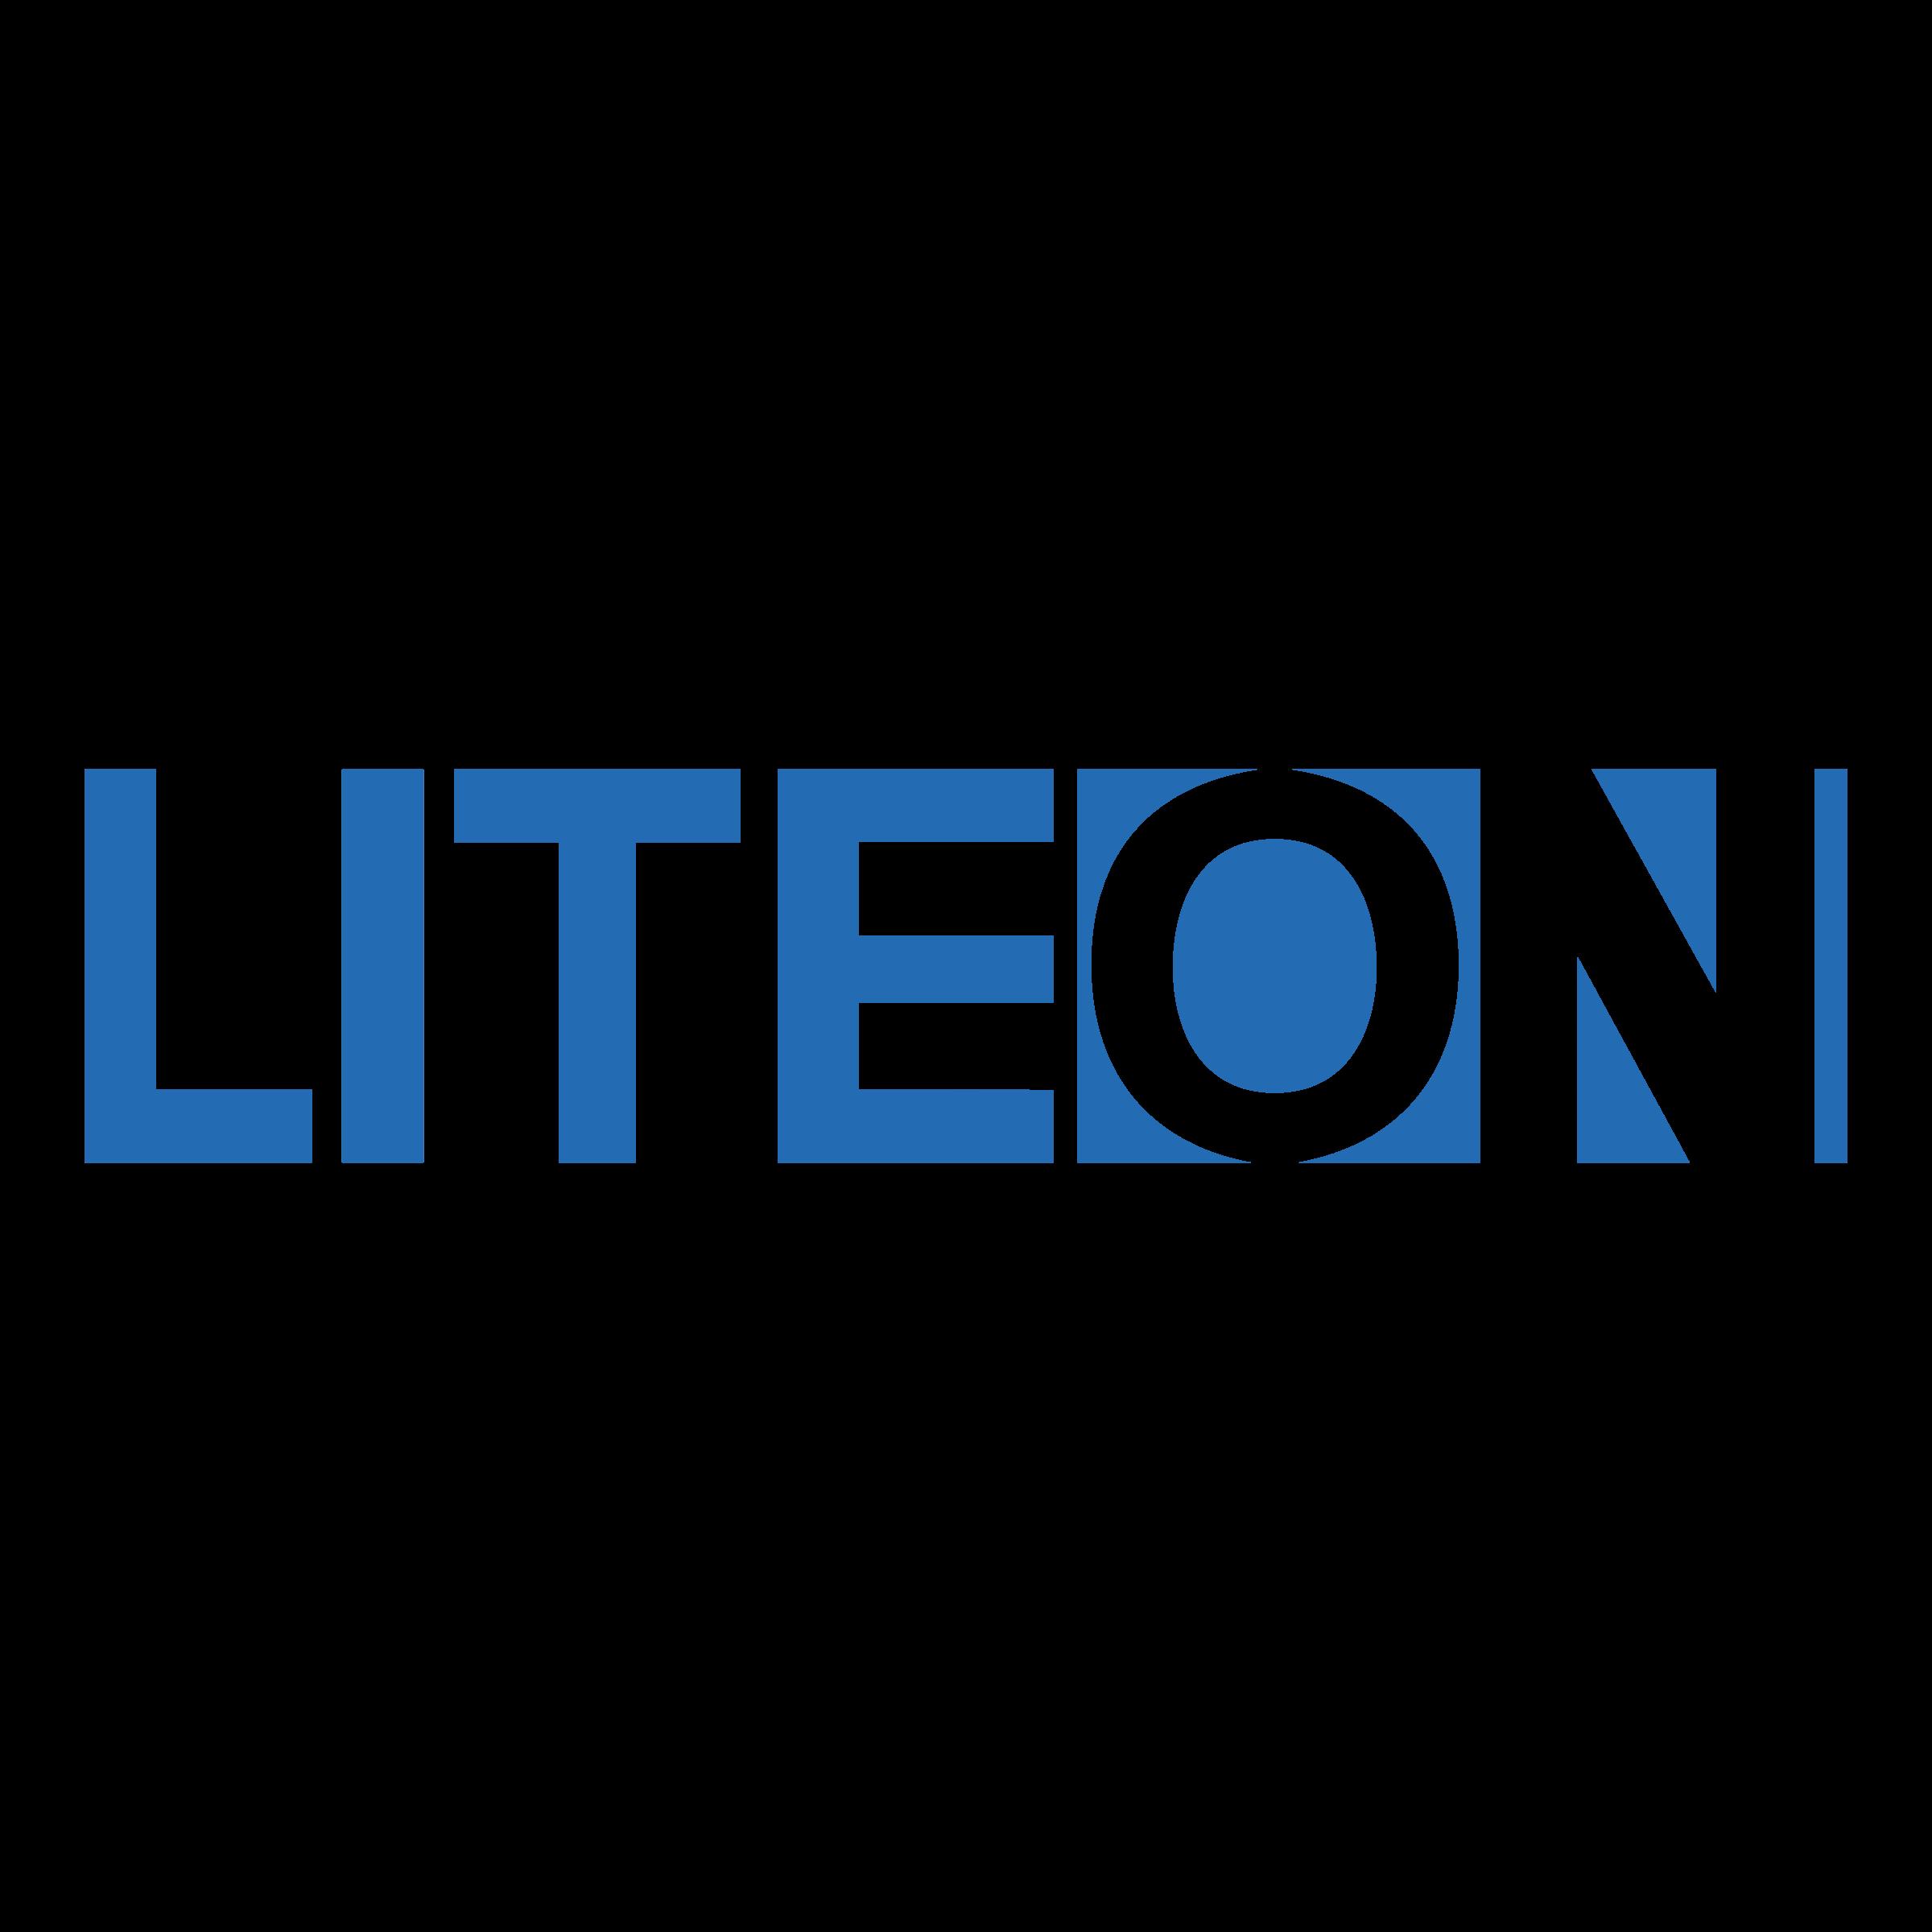 https://0201.nccdn.net/1_2/000/000/116/bad/liteon-logo-png-transparent-2400x2400.png